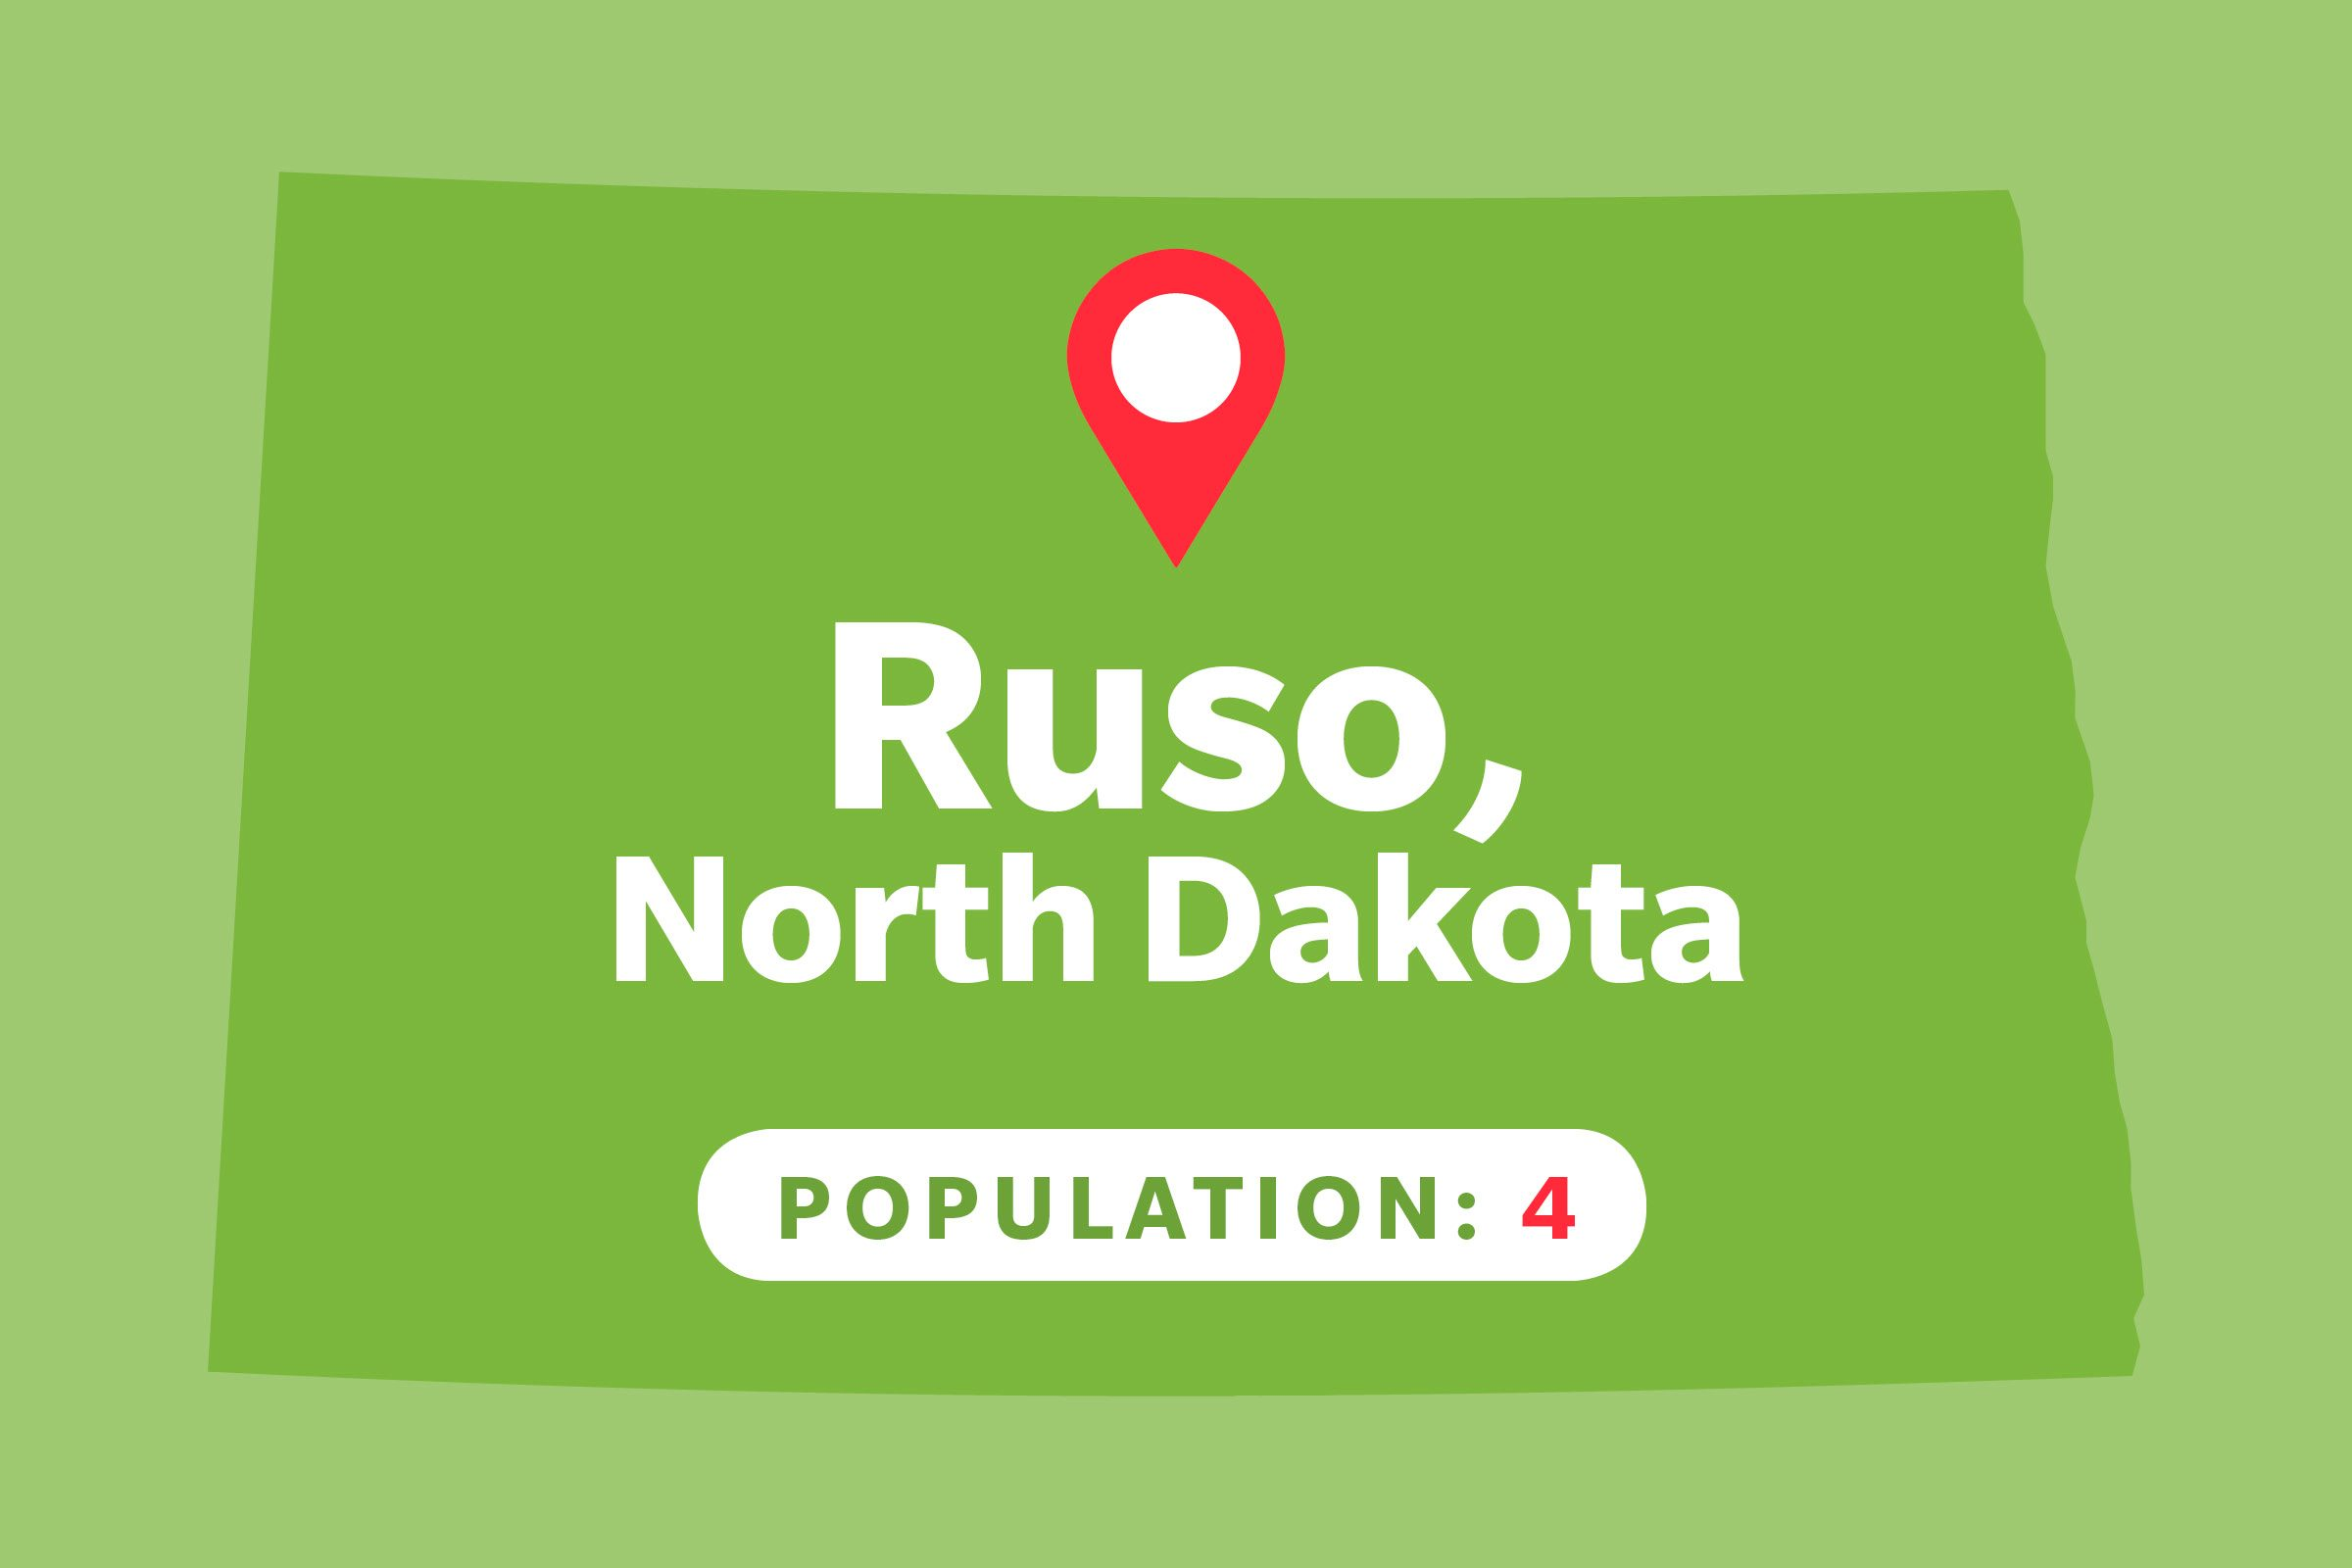 Ruso, North Dakota